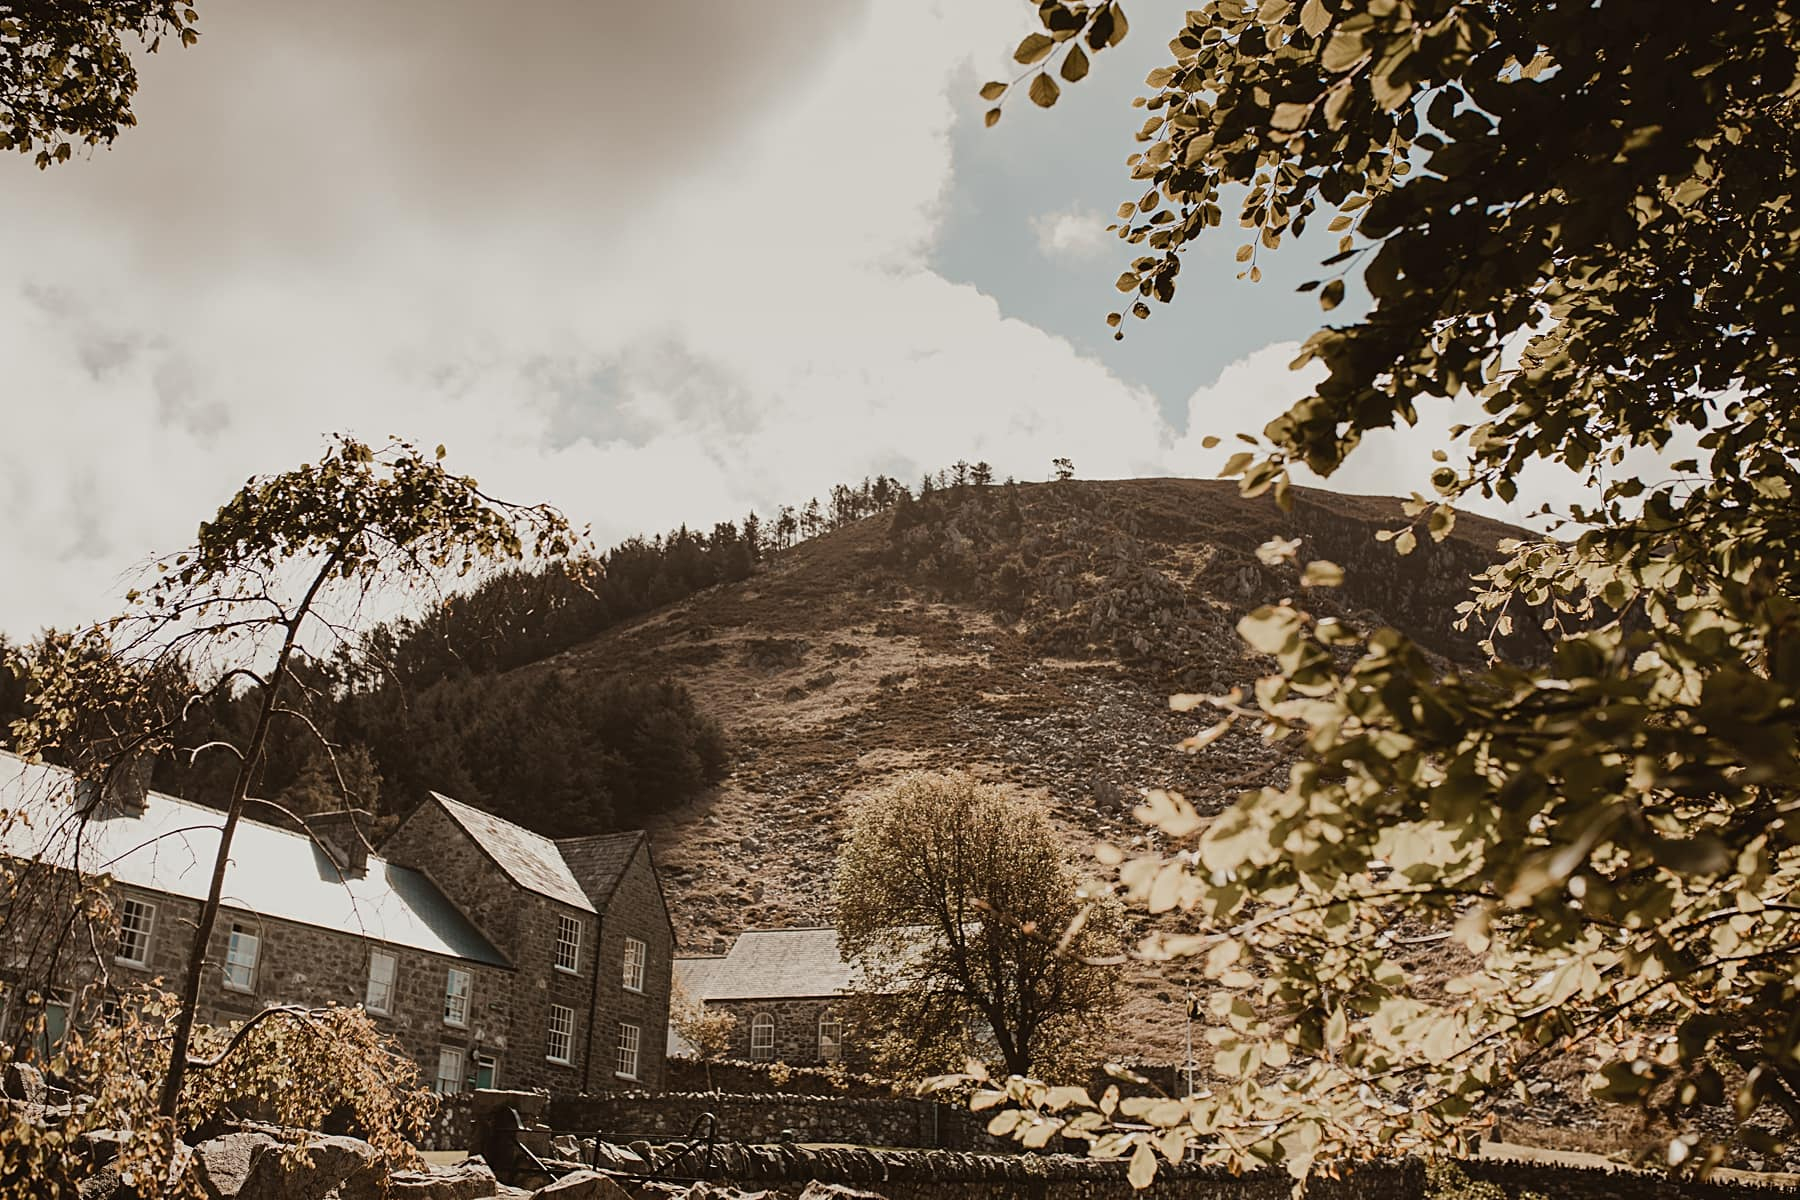 views surrounding Nant Gwrtheyrn